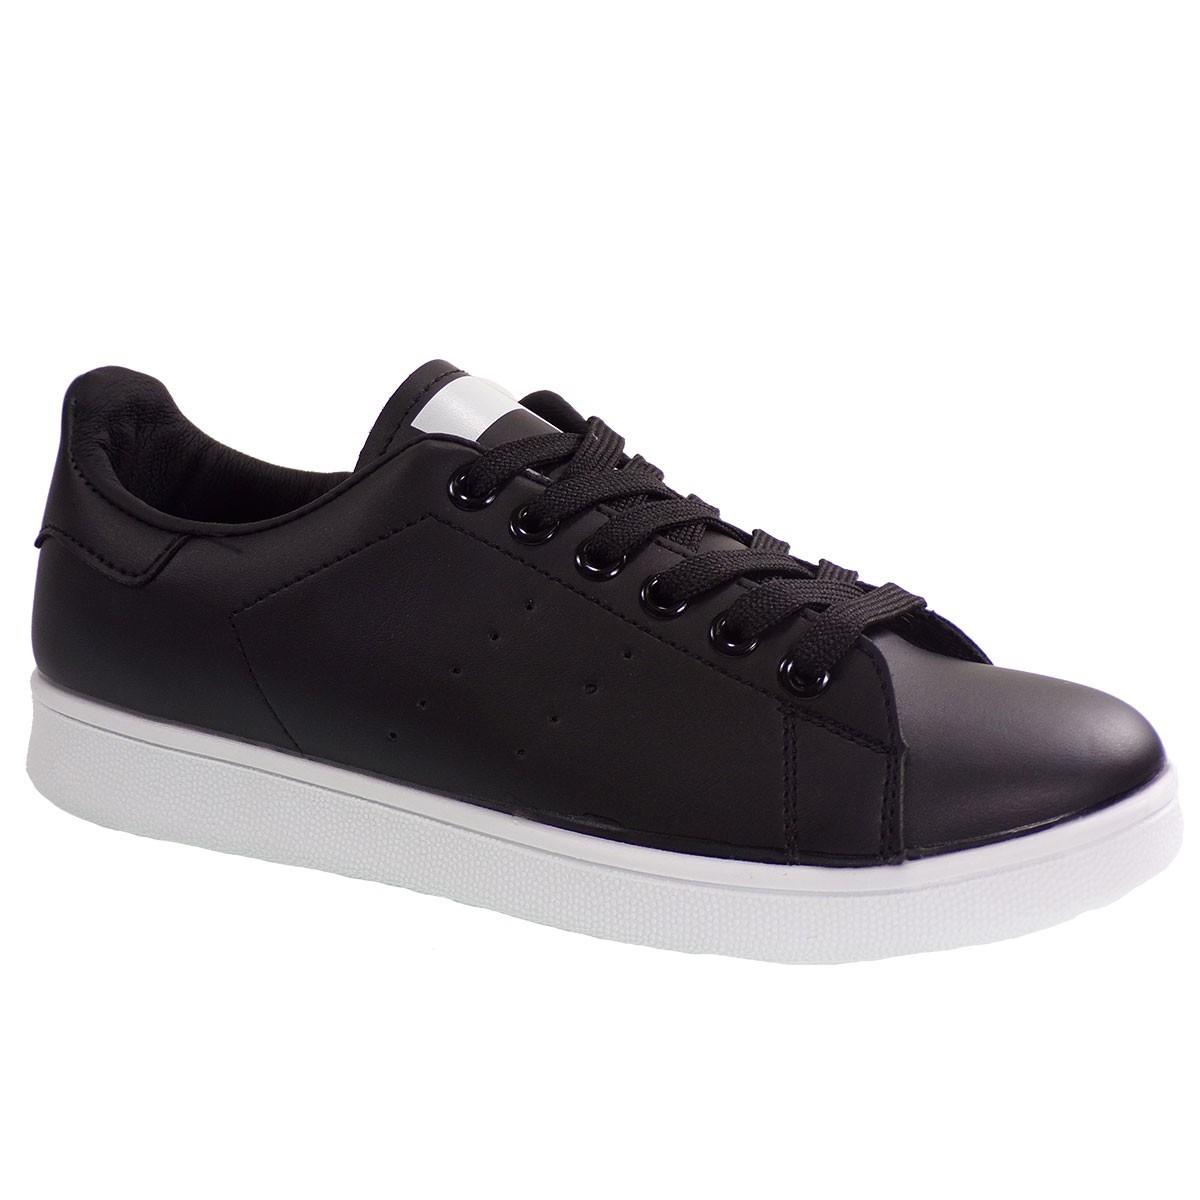 Bagiota Shoes Γυναικεία Παπούτσια Sneakers Αθλητικά C8241 Μαύρο